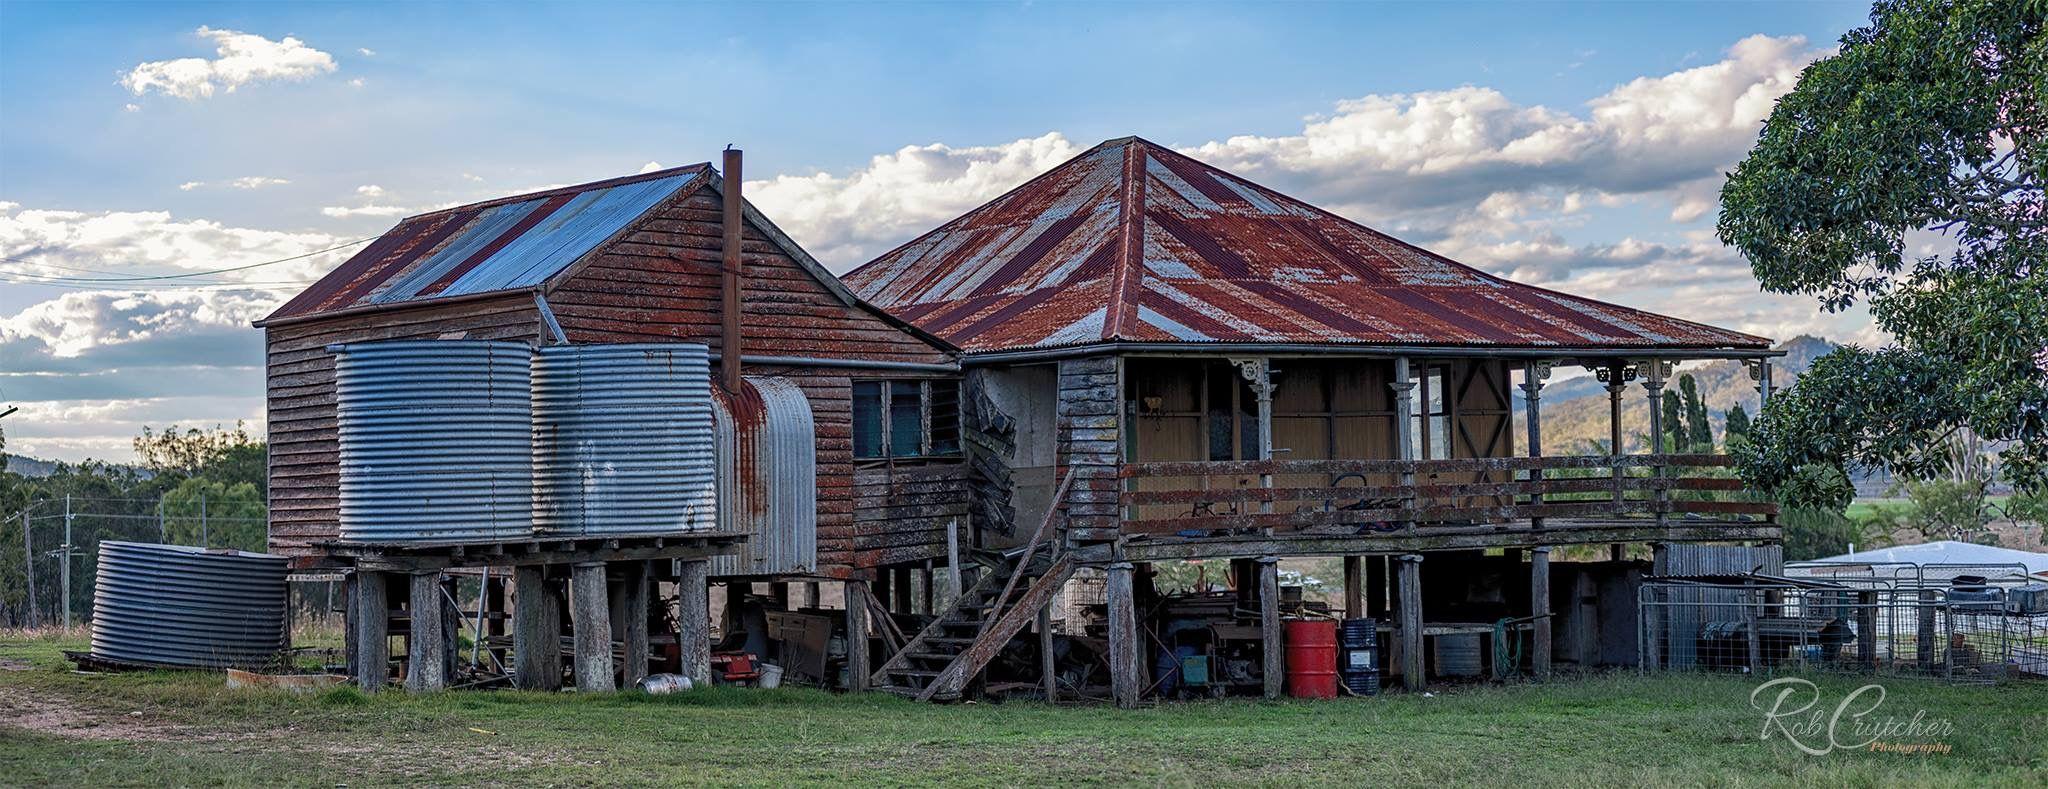 Verandah Of Abandoned Farm House Somerset Region S E Queensland Abandoned Houses Old Abandoned Buildings Australian Homes